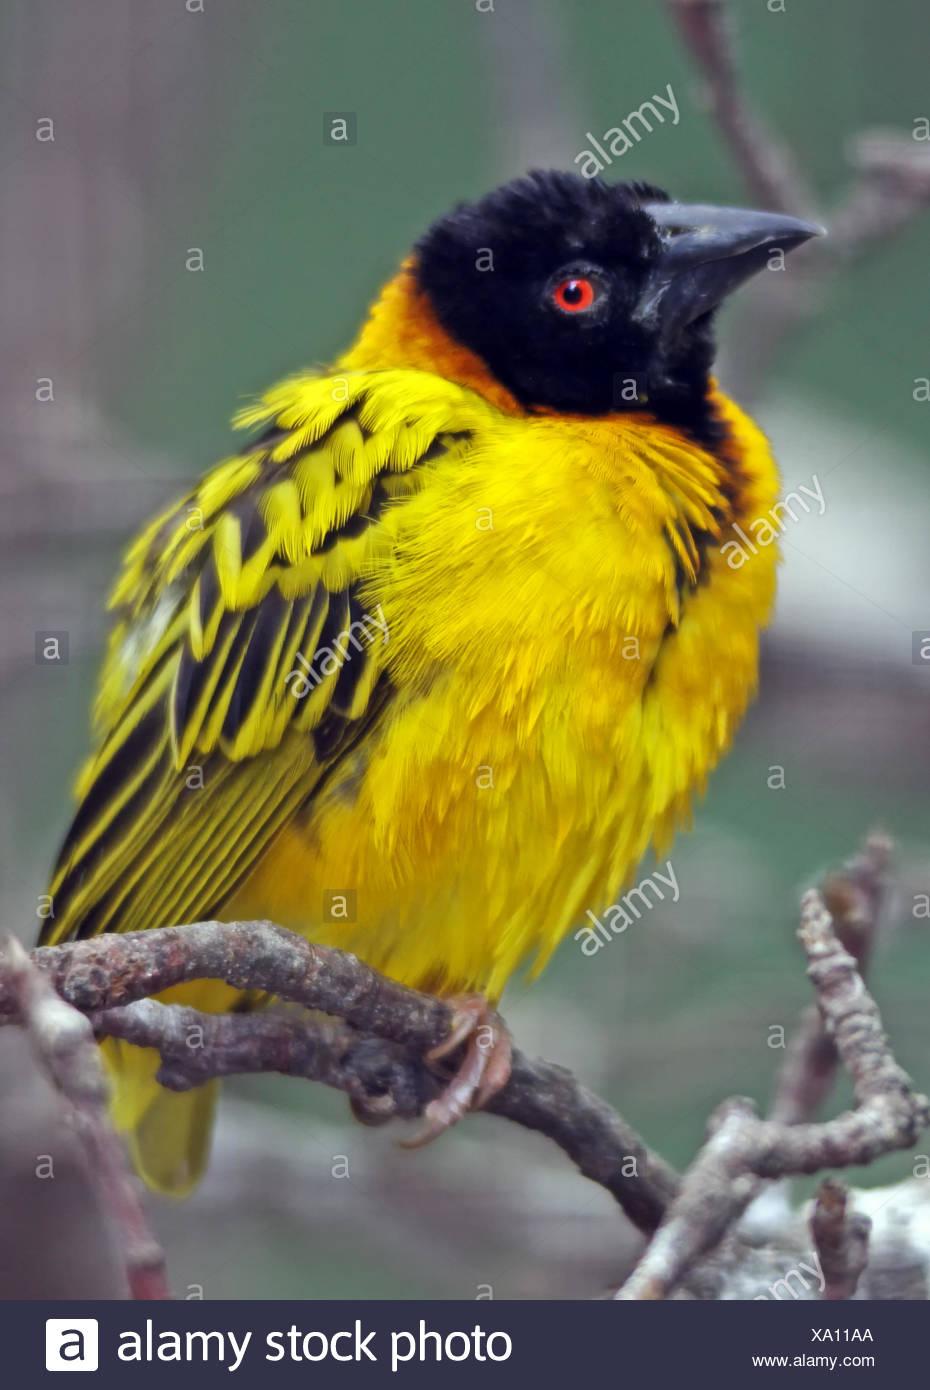 yellow, bird, male, masculine, birds, south africa, angola, sudan, yellow, - Stock Image